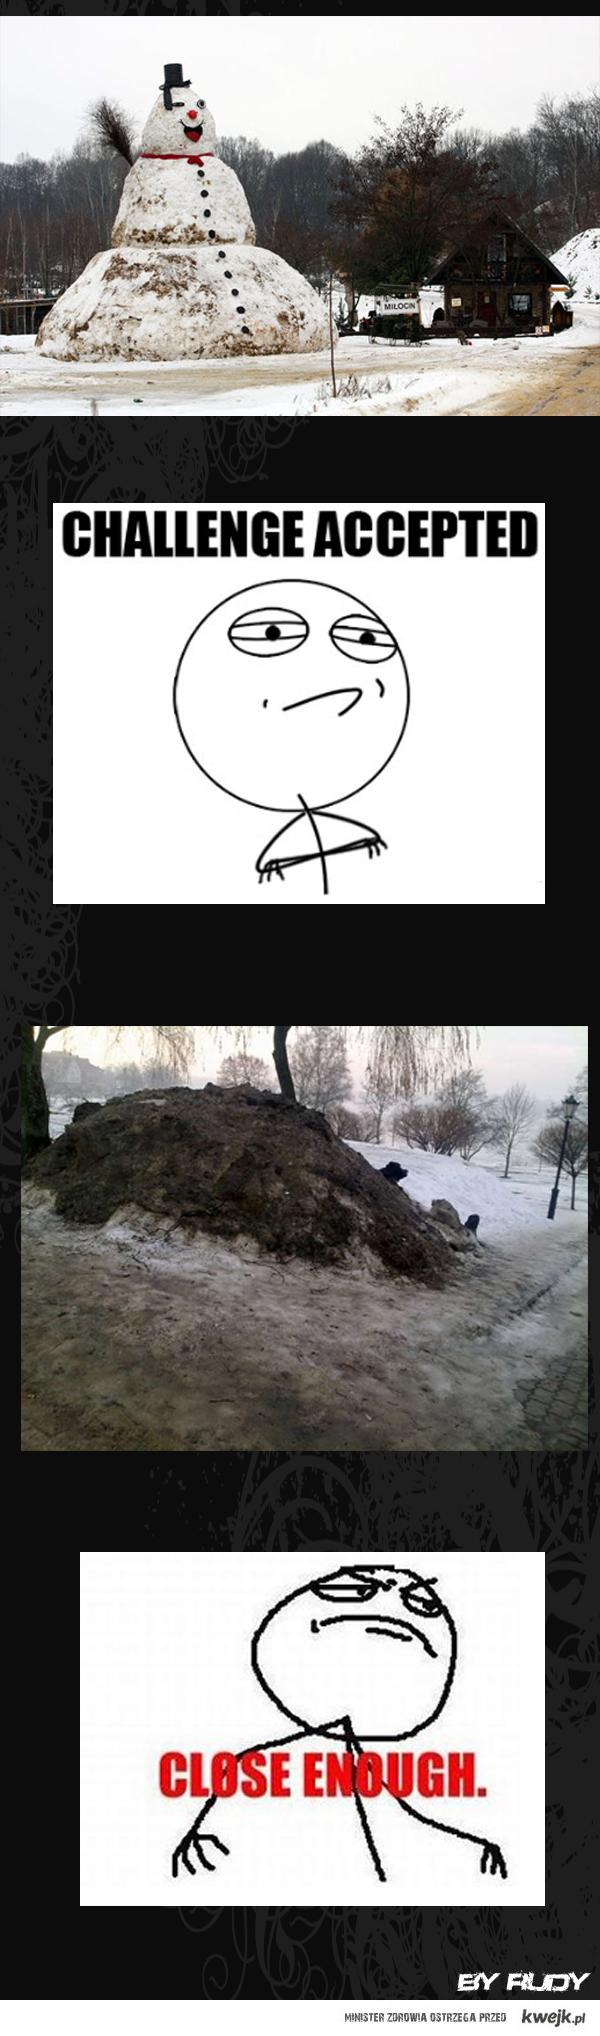 snieg i balwan, jak co roku;)